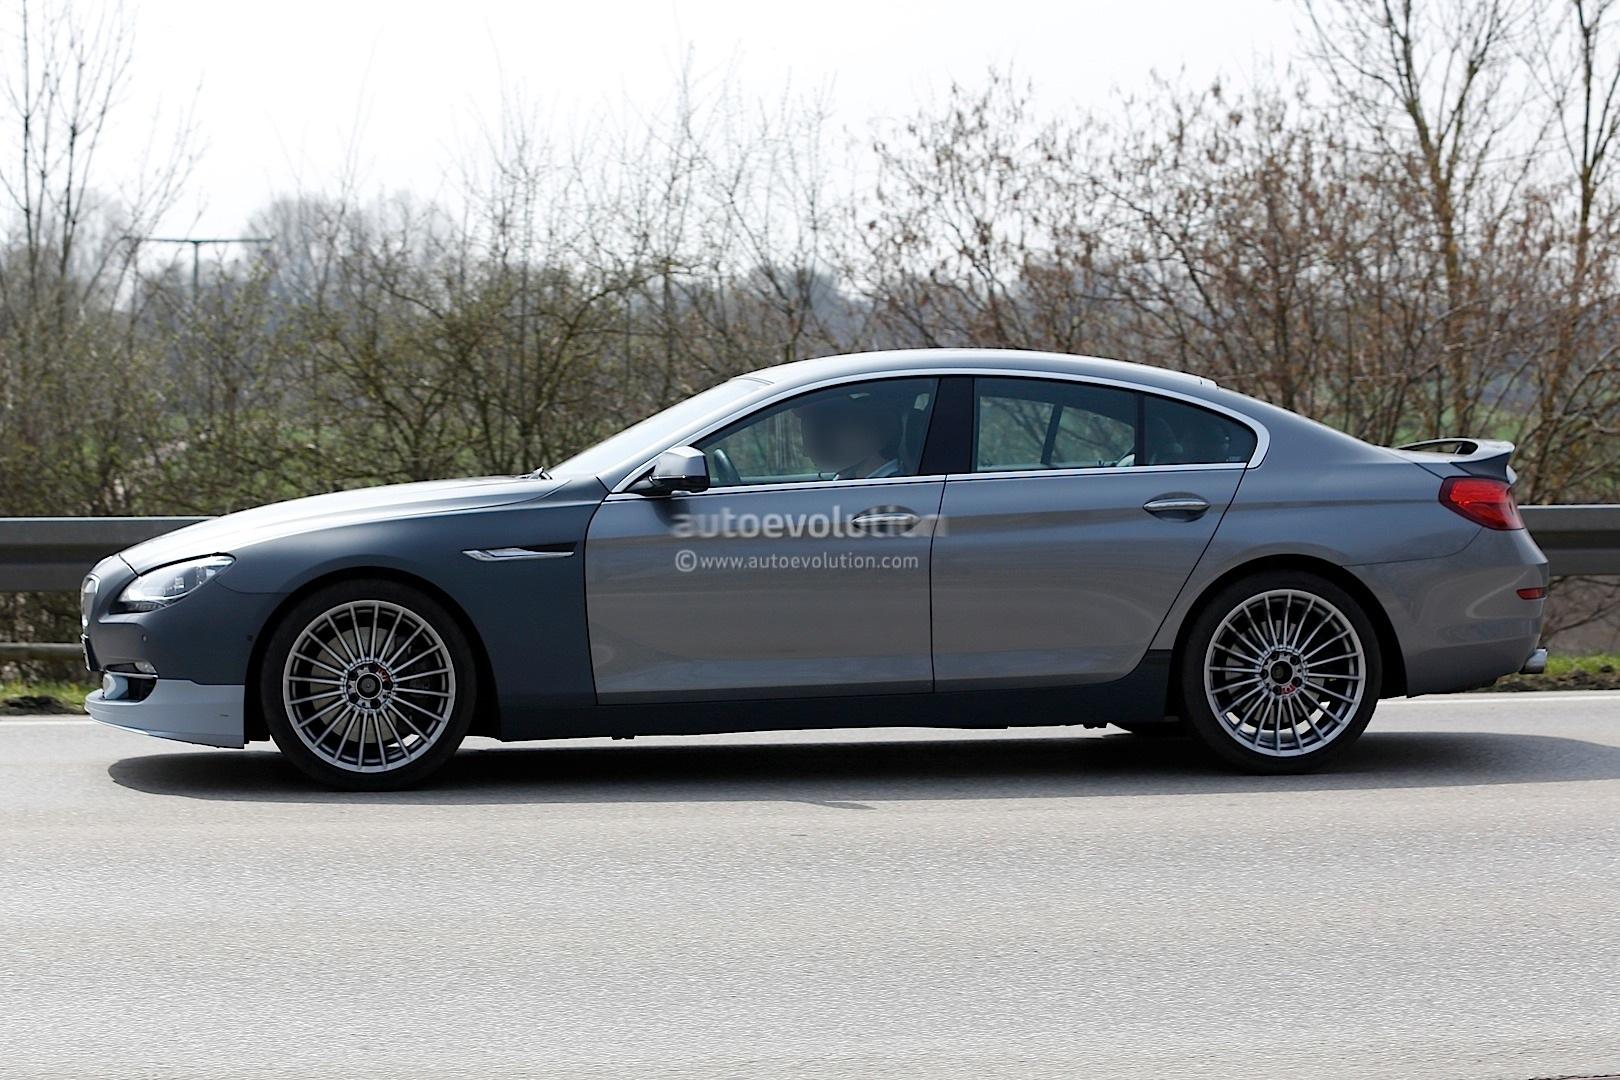 2012 - [BMW] Série 6 / M6 Gran Coupé [F06] - Page 10 Spyshots-alpina-b6-biturbo-gran-coupe_3